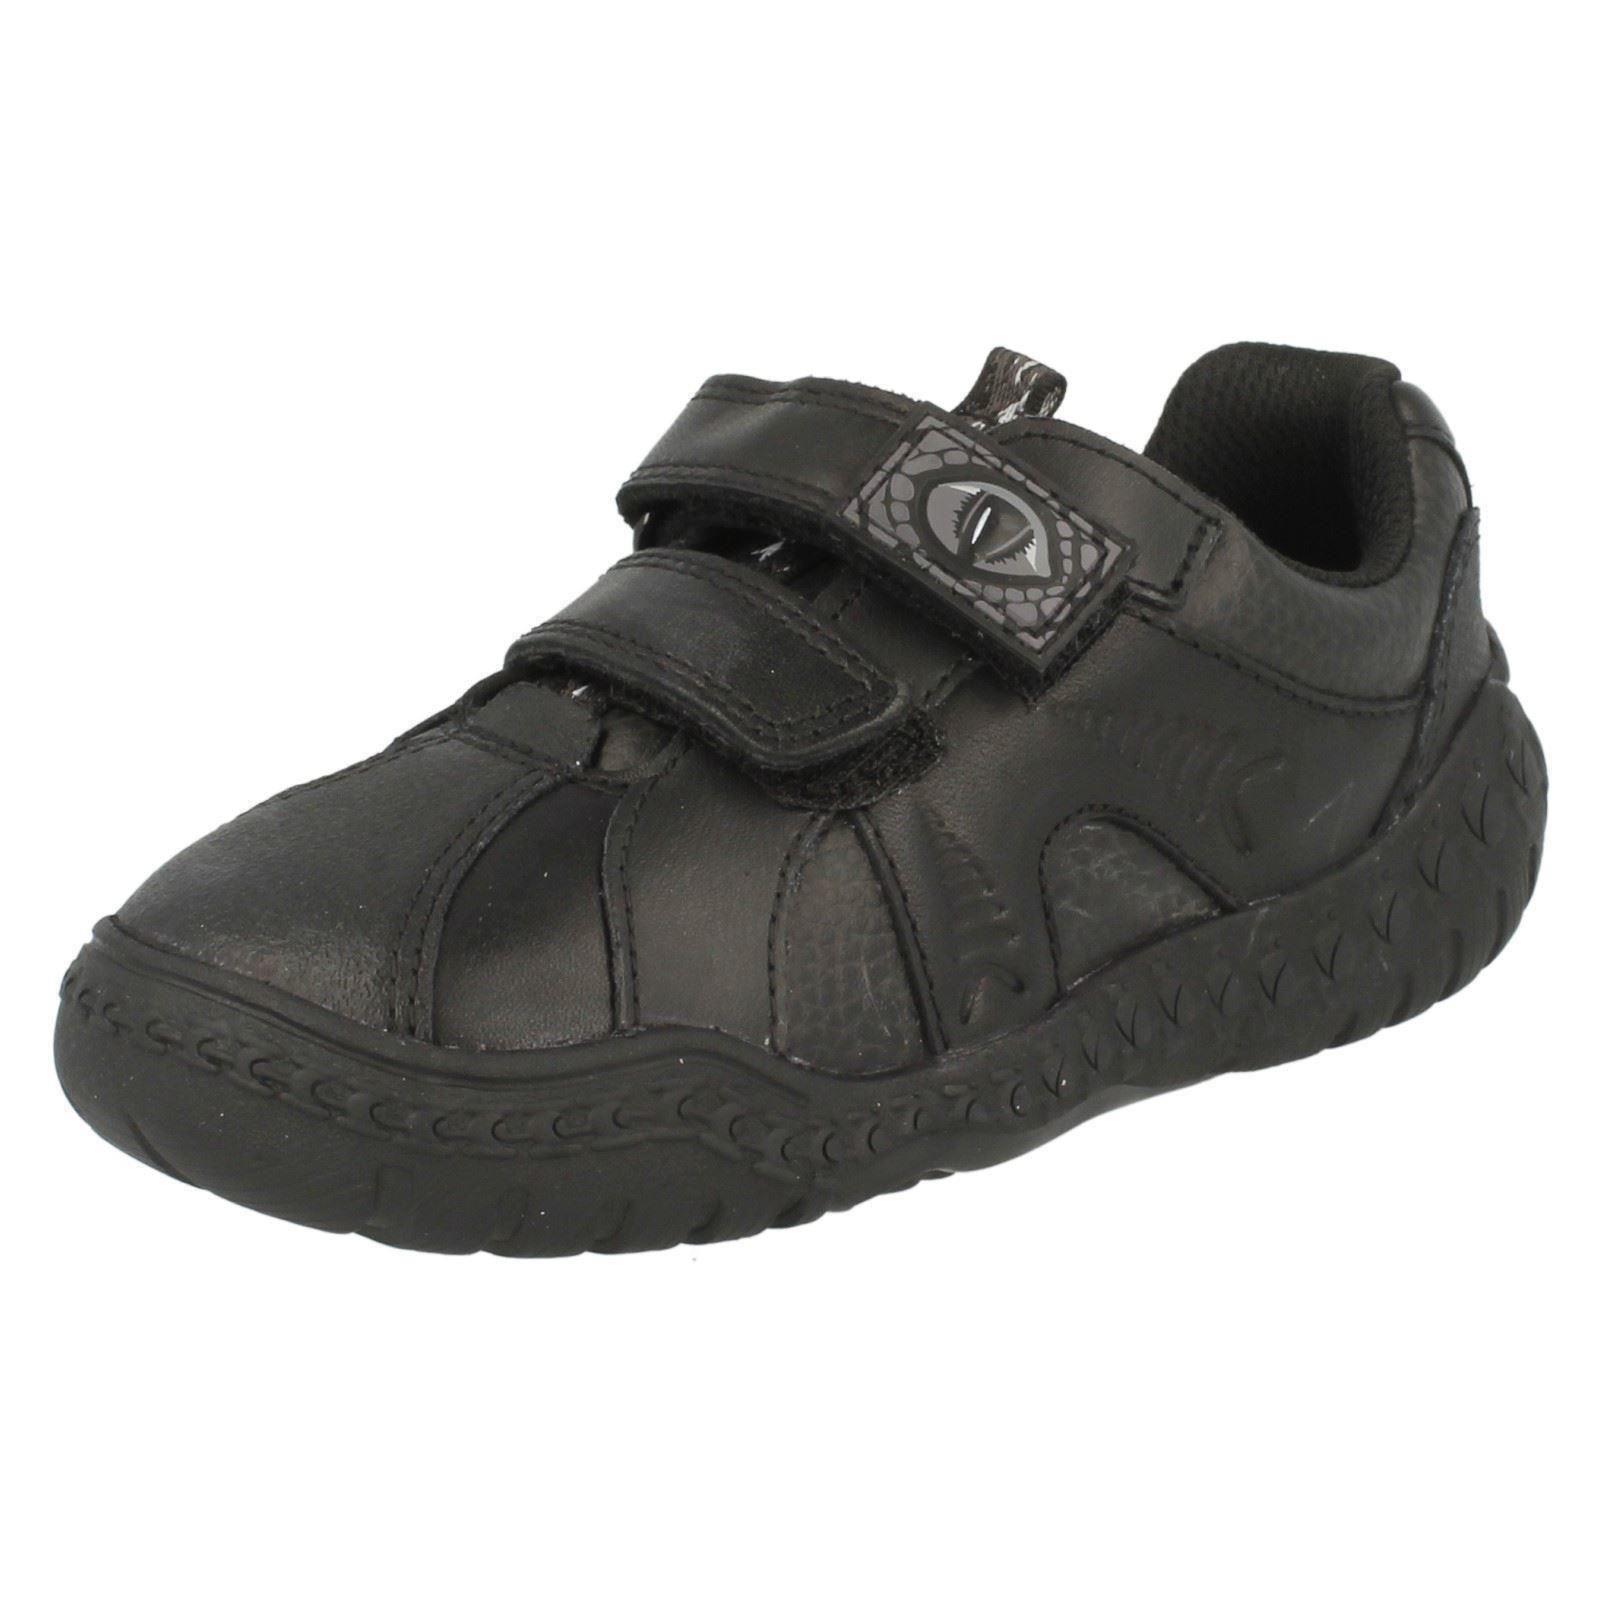 boys school shoes Clarks Stomp Roar Junior black size 2 H STOMPO leather